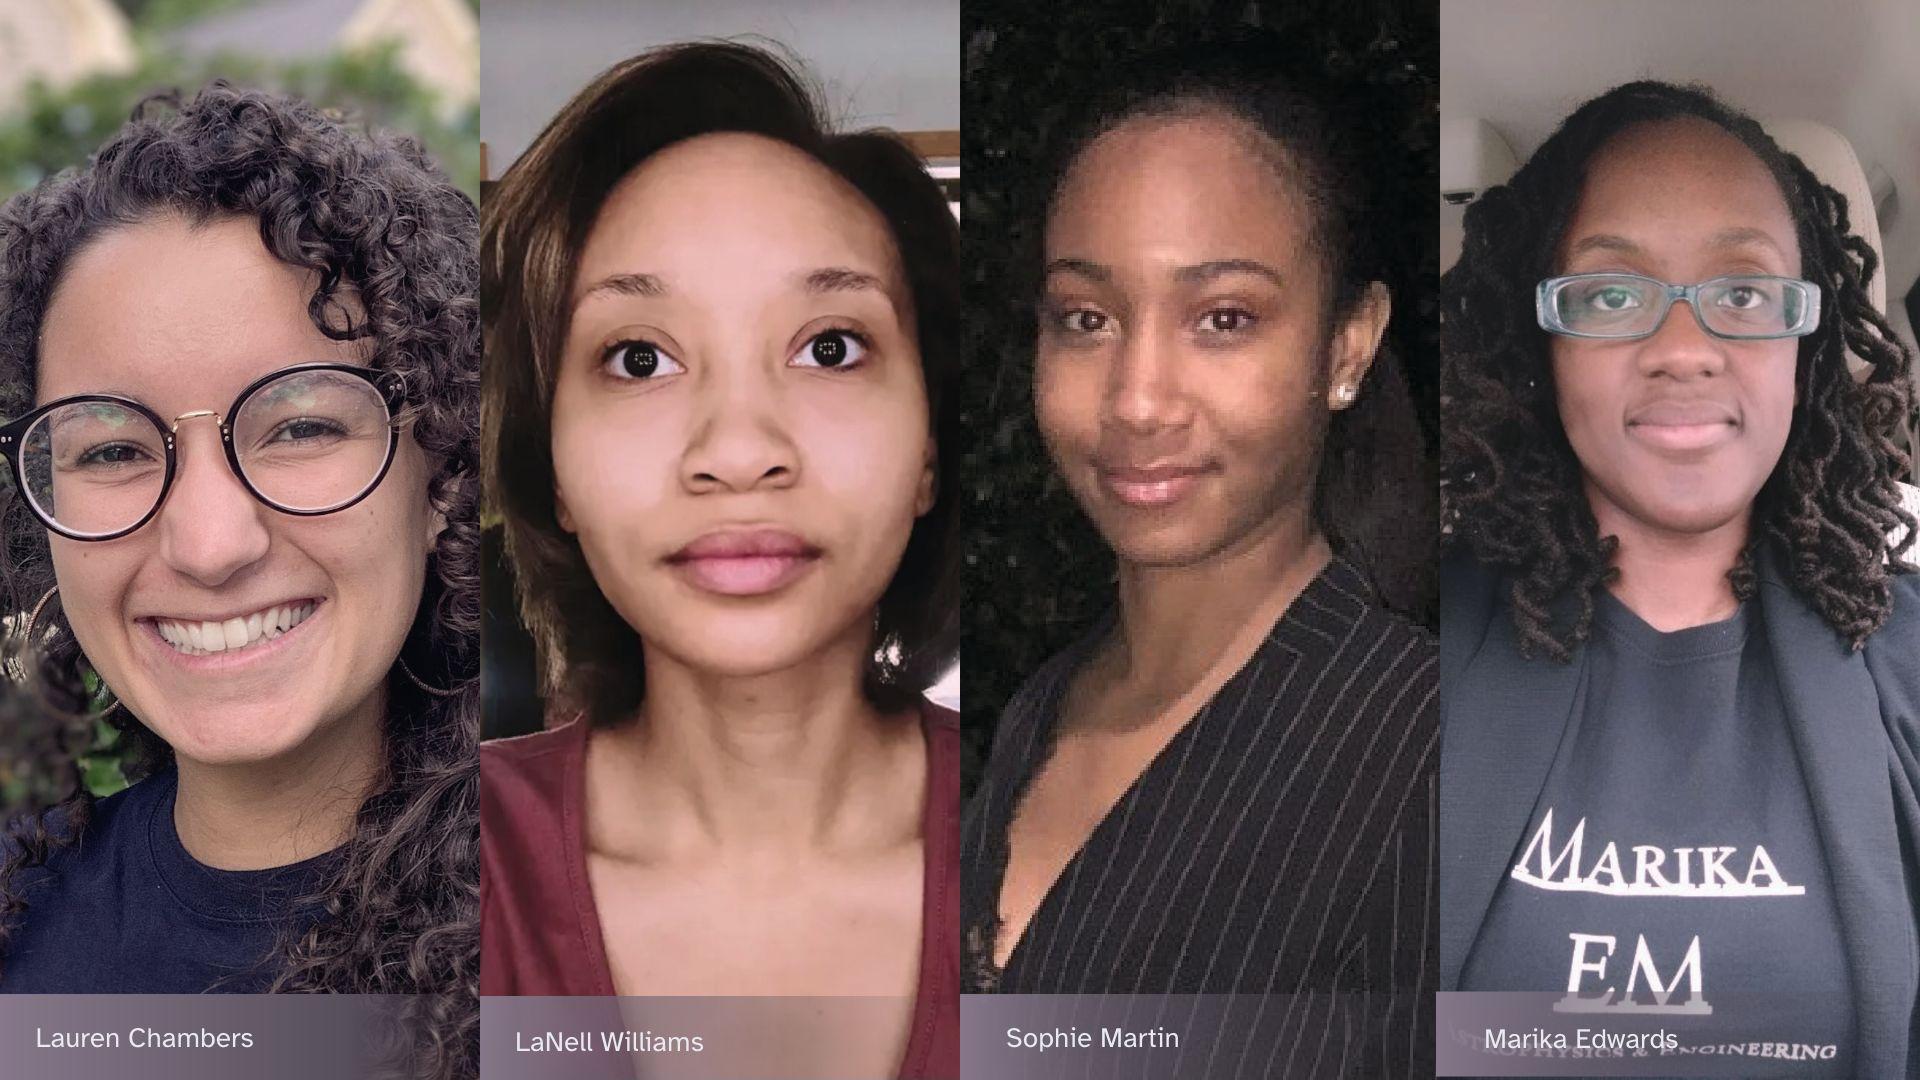 Photographs of Sophie Martin, LaNell Williams, Marika Edwards, Lauren Chambers